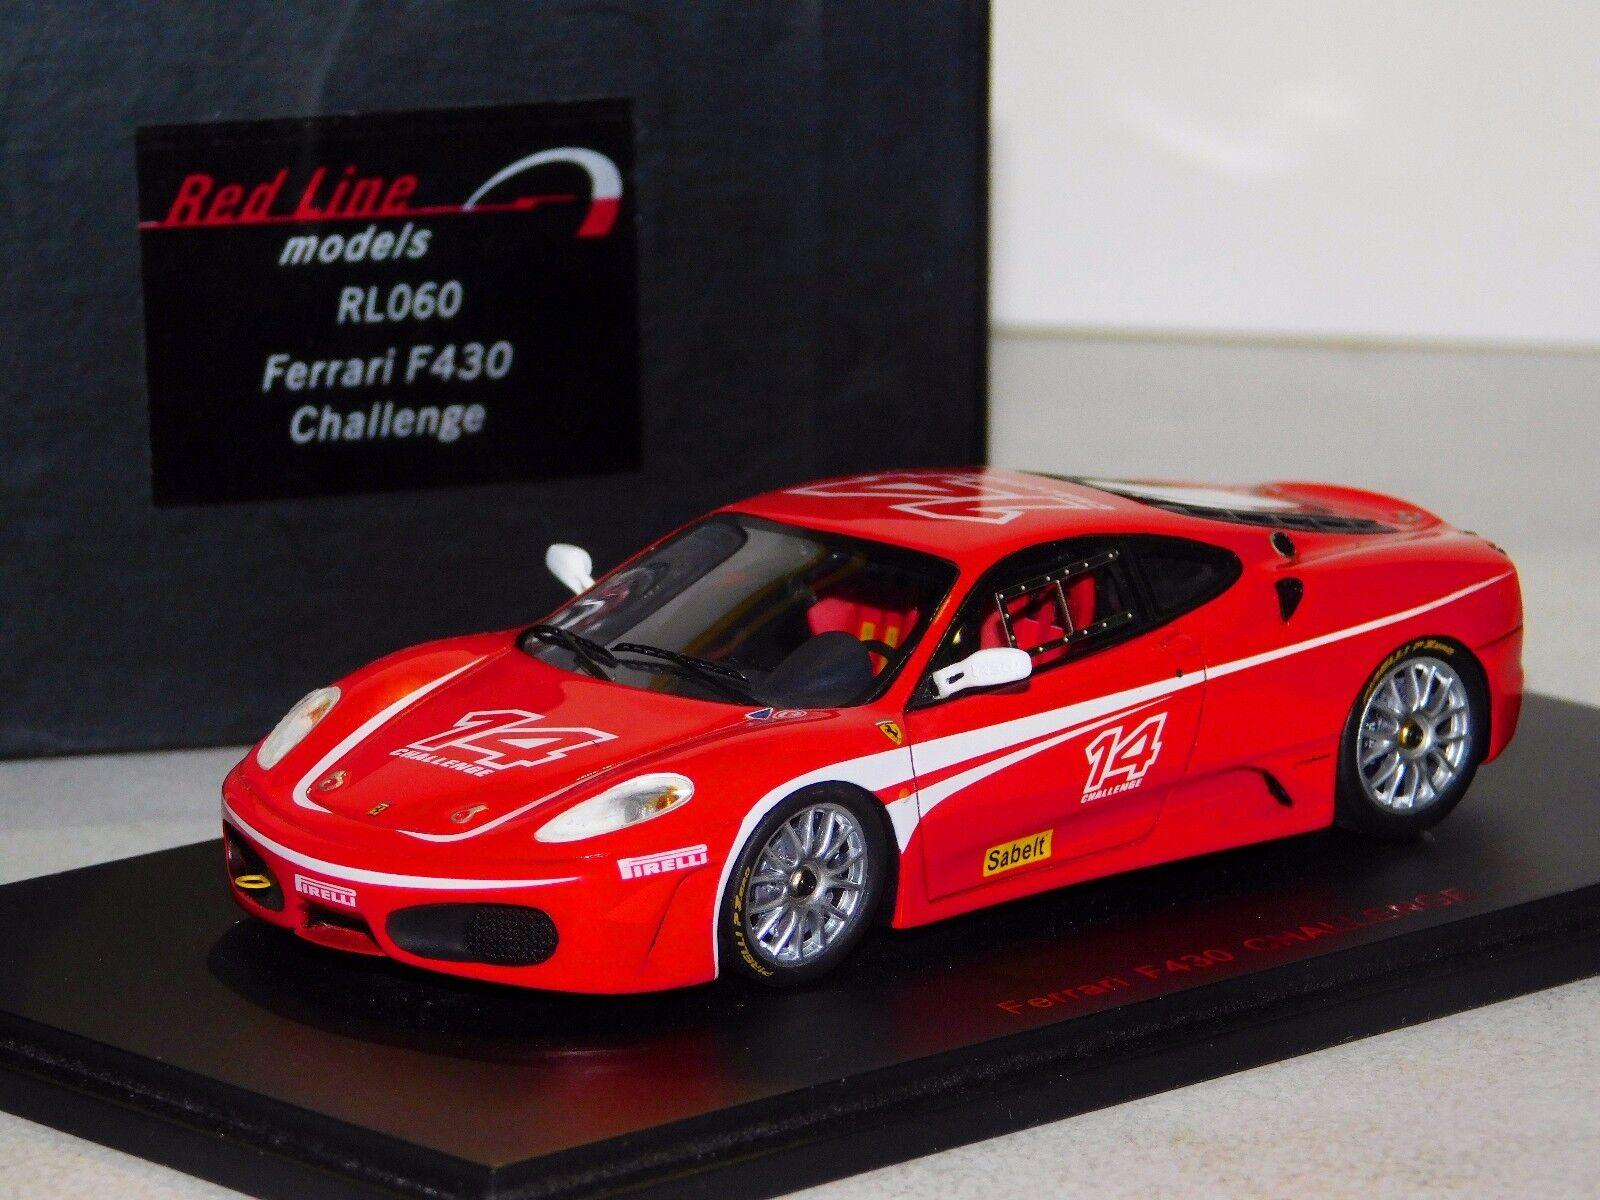 FERRARI F430 CHALLENGE rossoLINE rossoLINE rossoLINE RL060 1:43 b9e85c